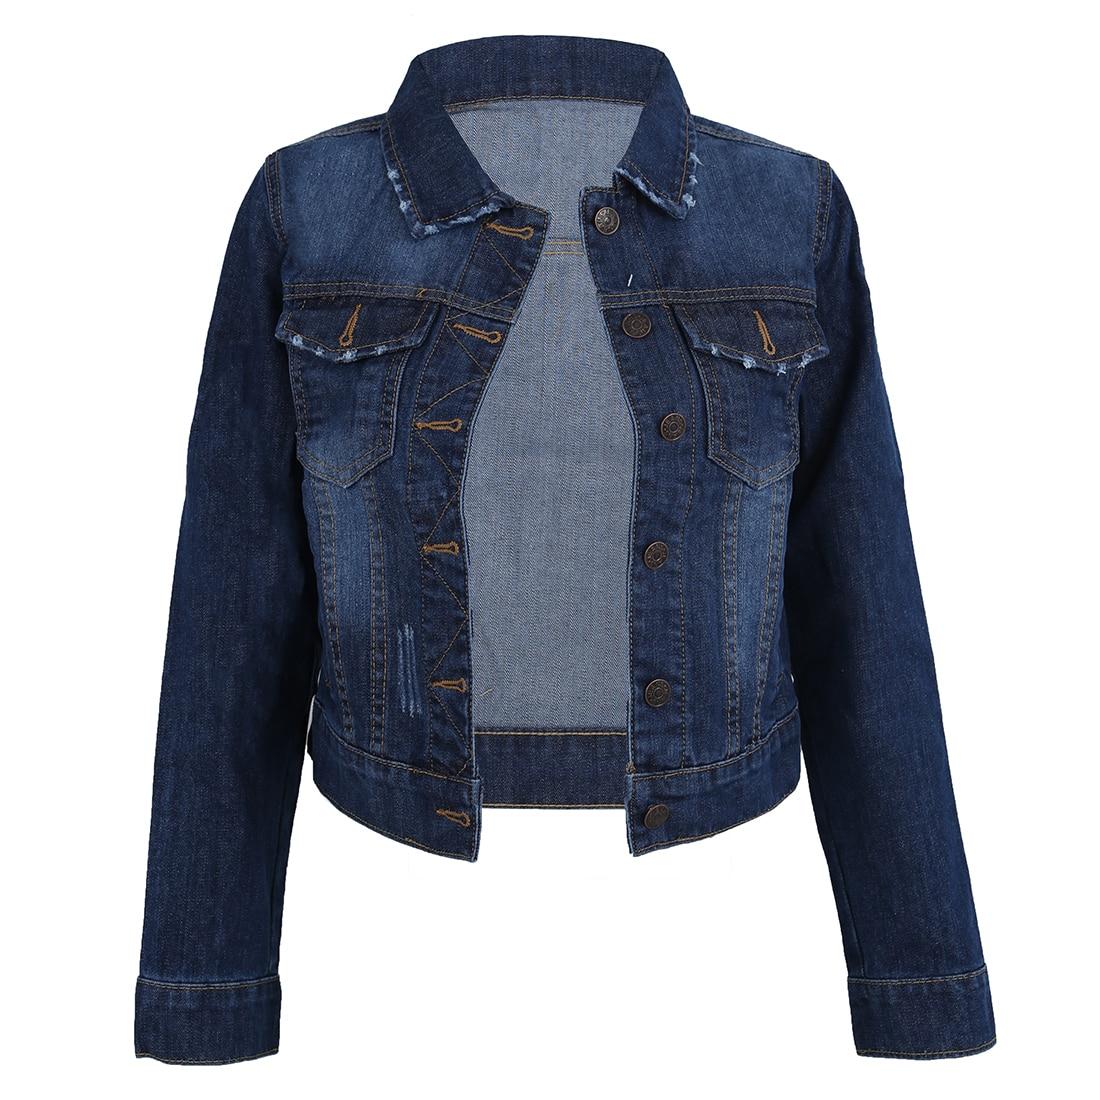 SAF-Women Lapel Cropped Denim <font><b>Jeans</b></font> Long <font><b>Sleeve</b></font> Jacket Coat Short